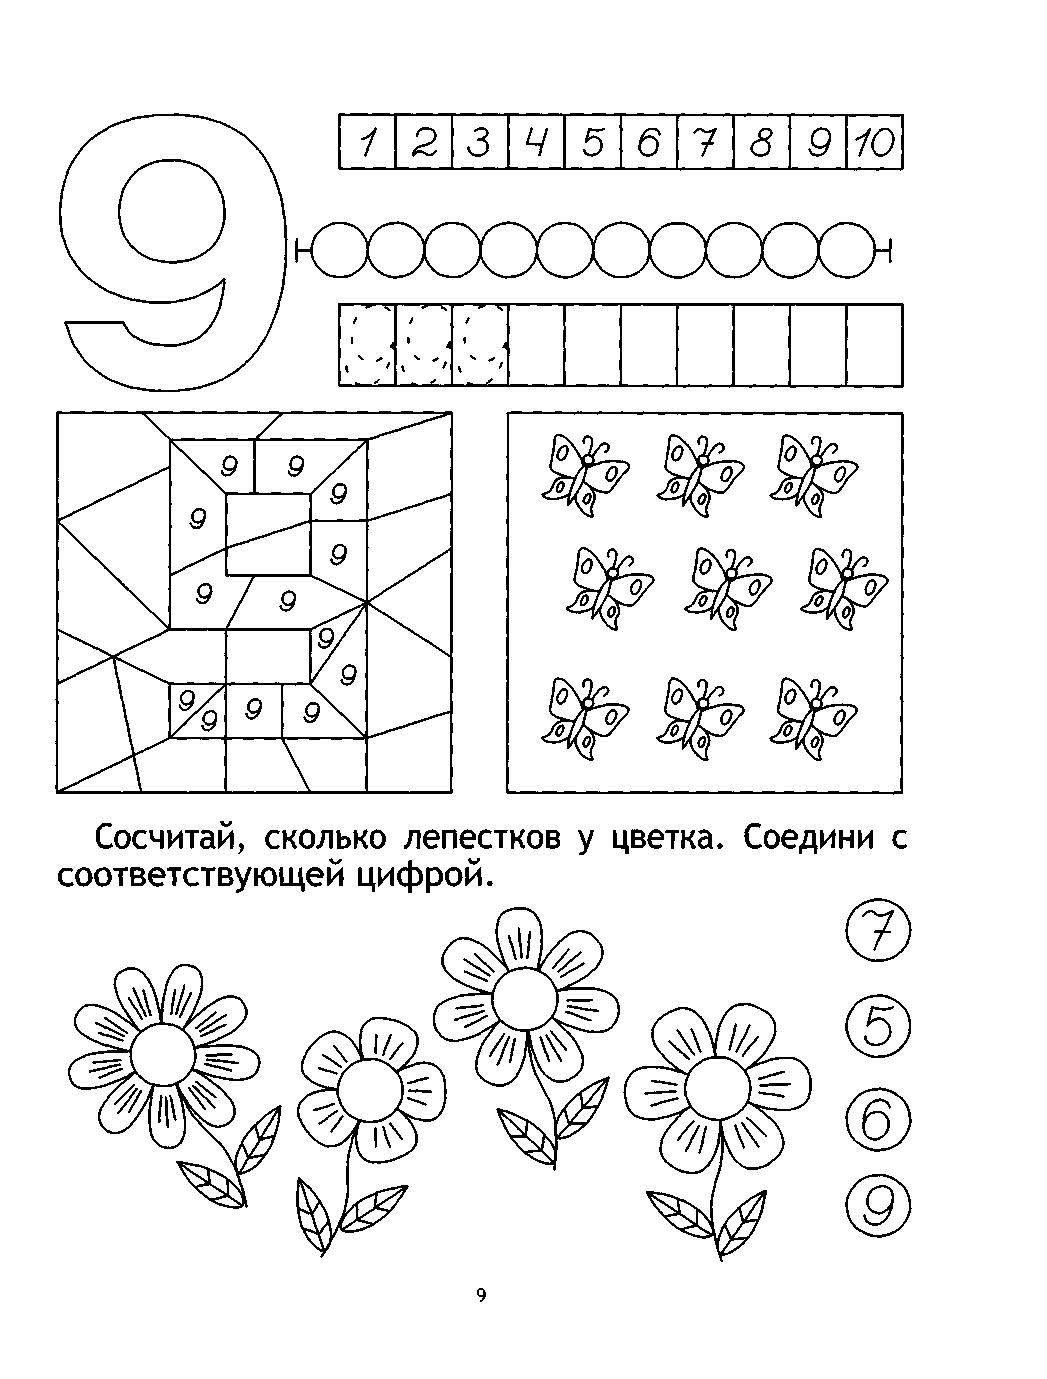 Математика знакомство с цифрой9